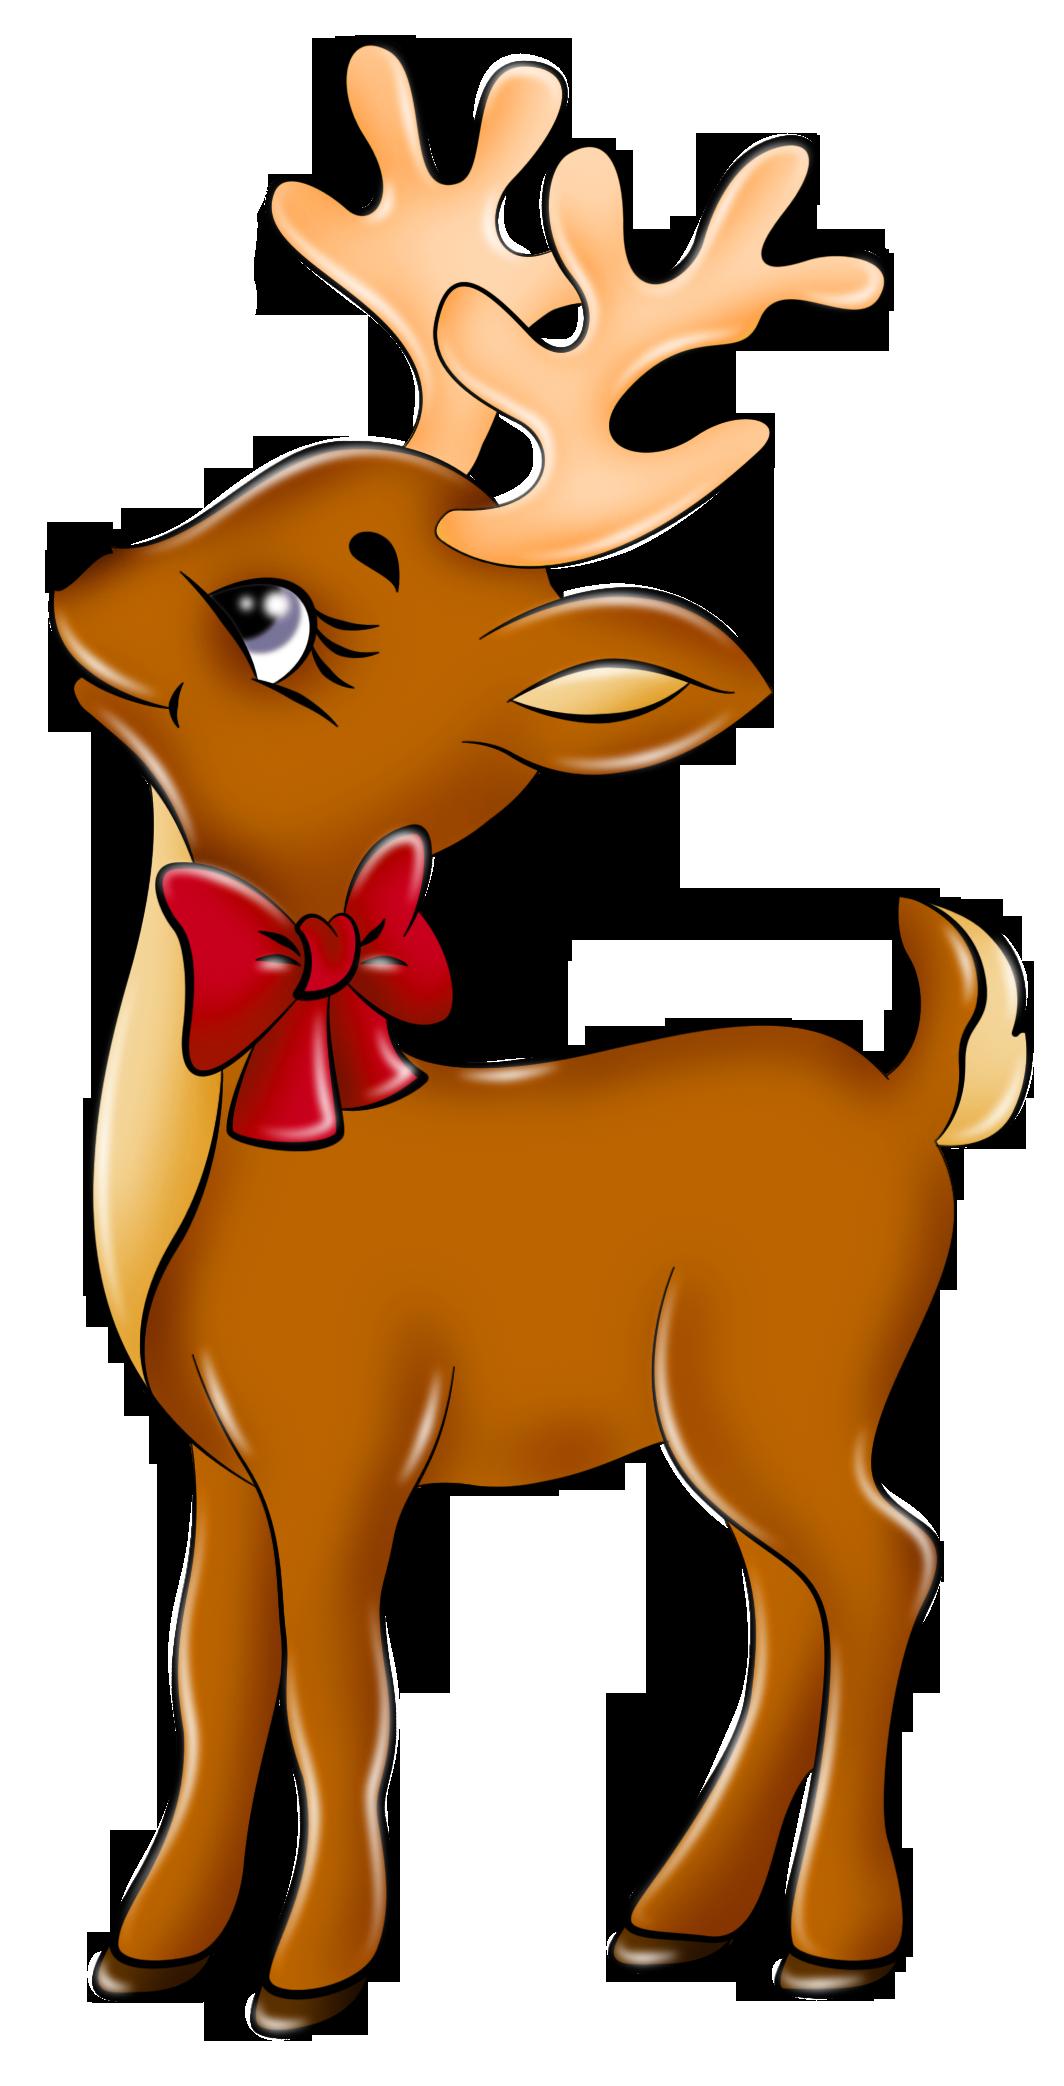 Reindeer Clip Art Free Image Free Clipar-Reindeer clip art free image free clipart image 4-8